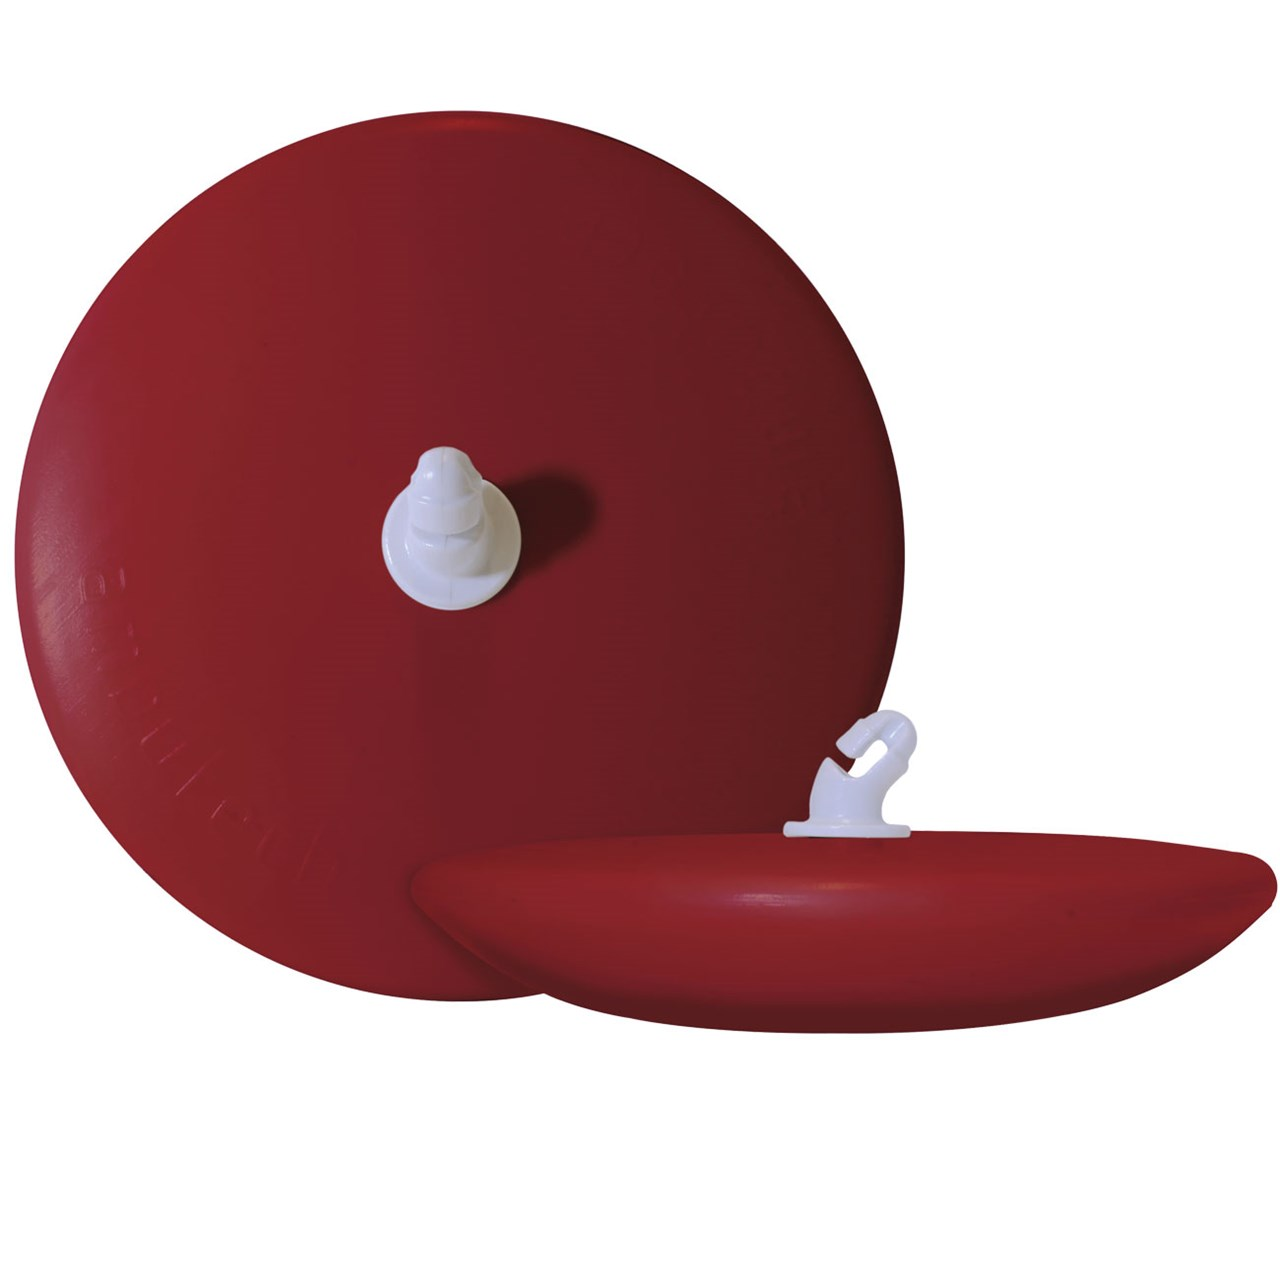 Ambutech Dakota Disk Cane Tip - Red